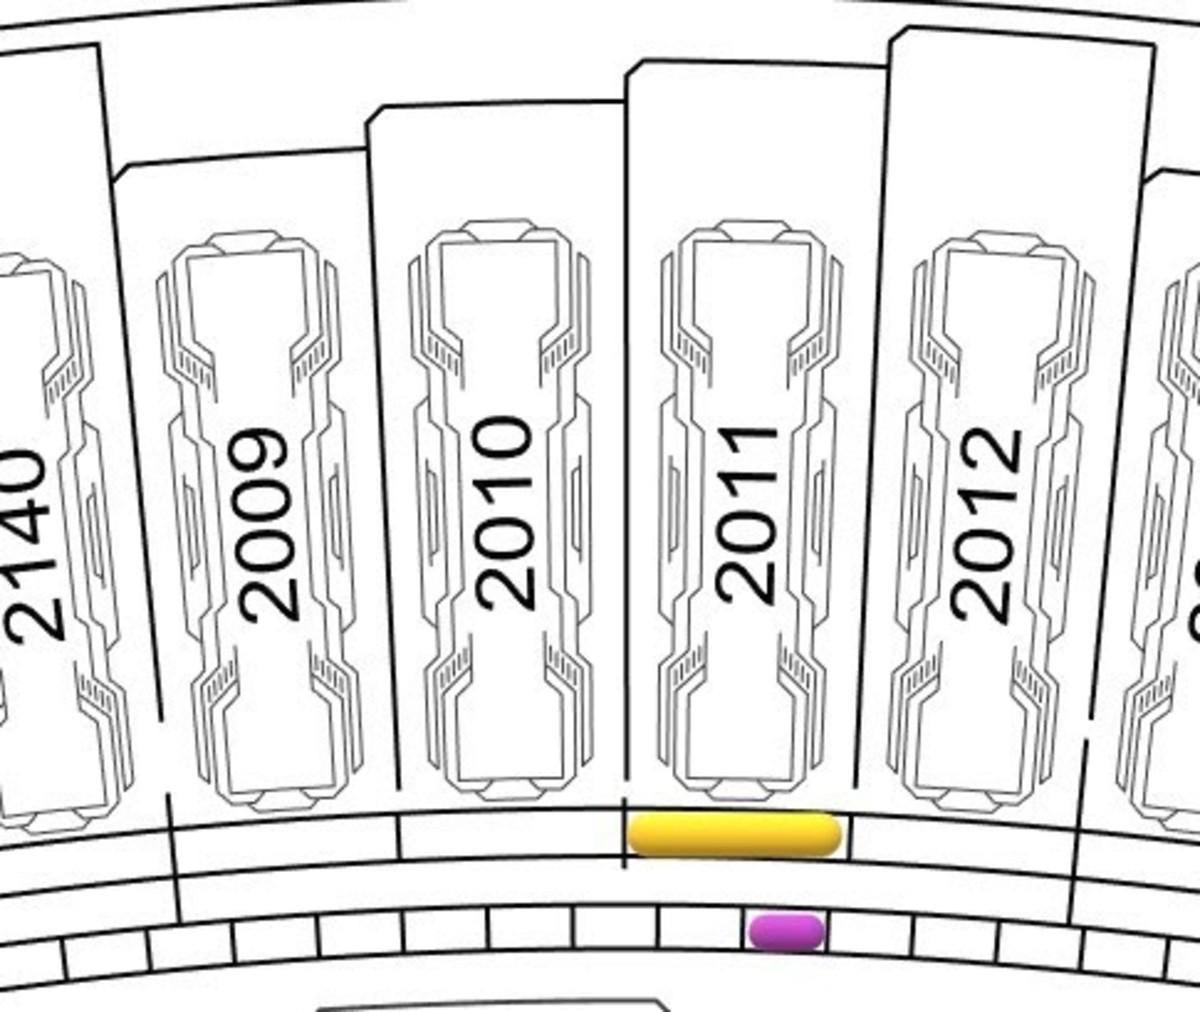 Yellow tracks calendar years, purple tracks difficulty adjustments.